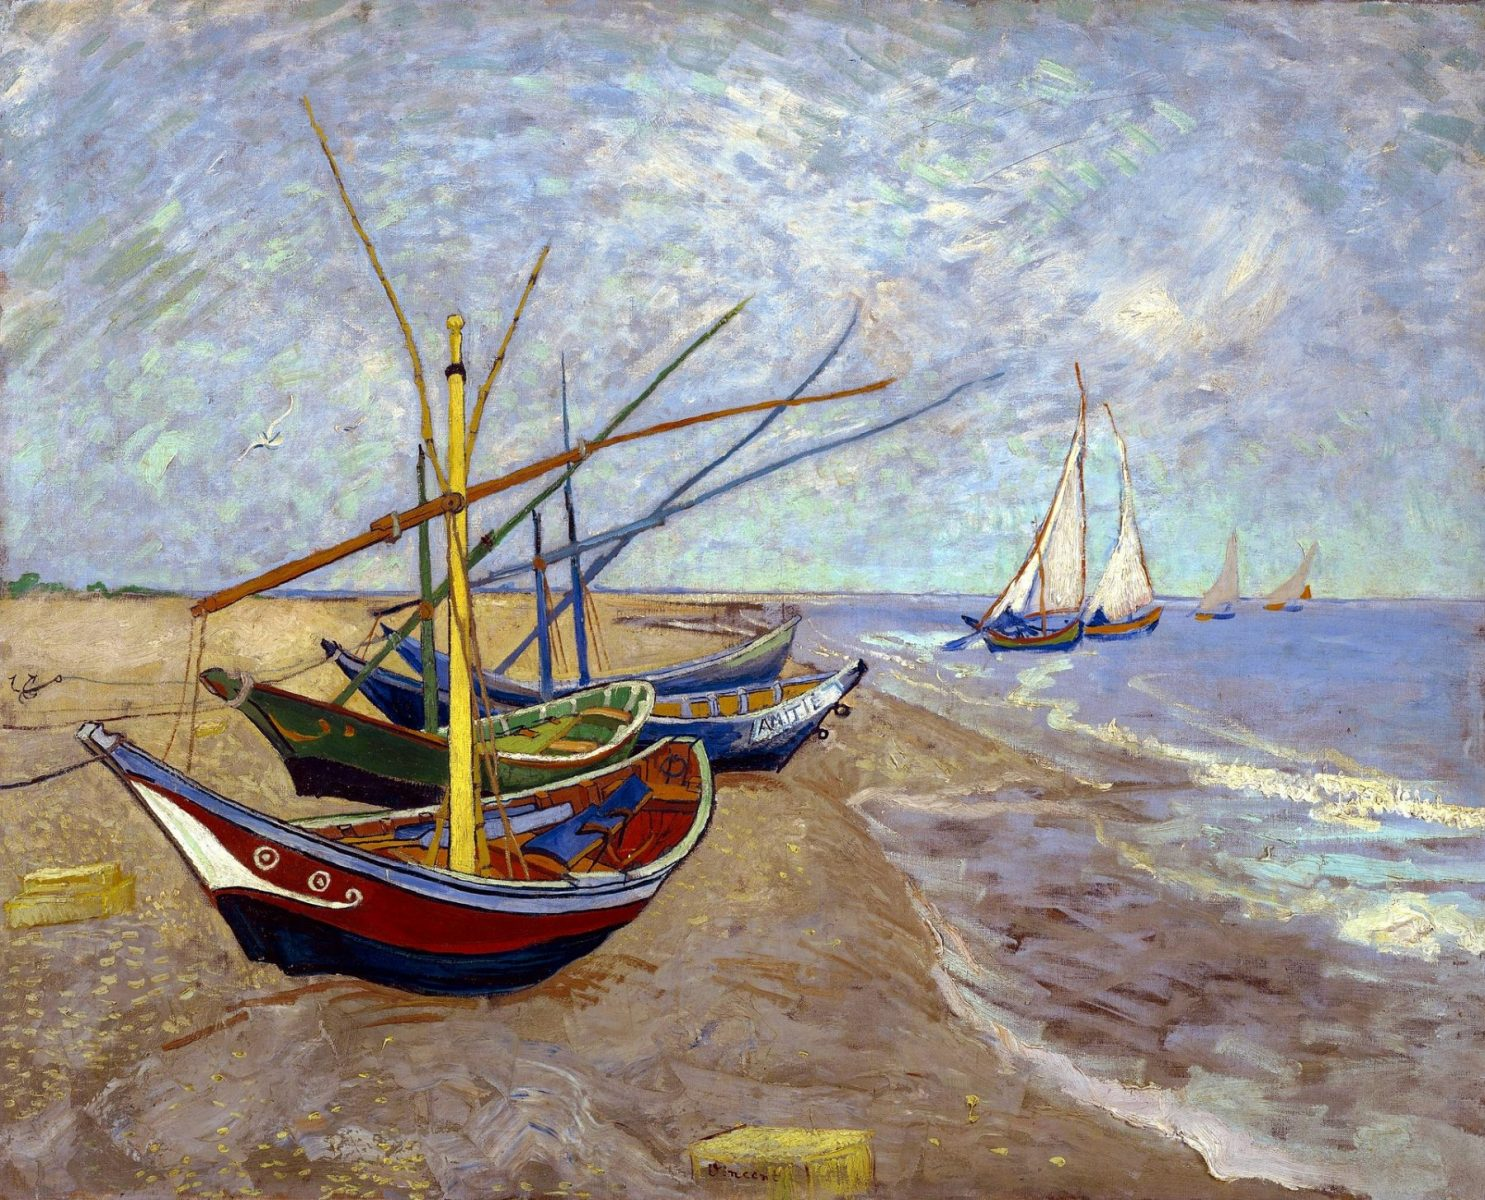 muzee van Gogh